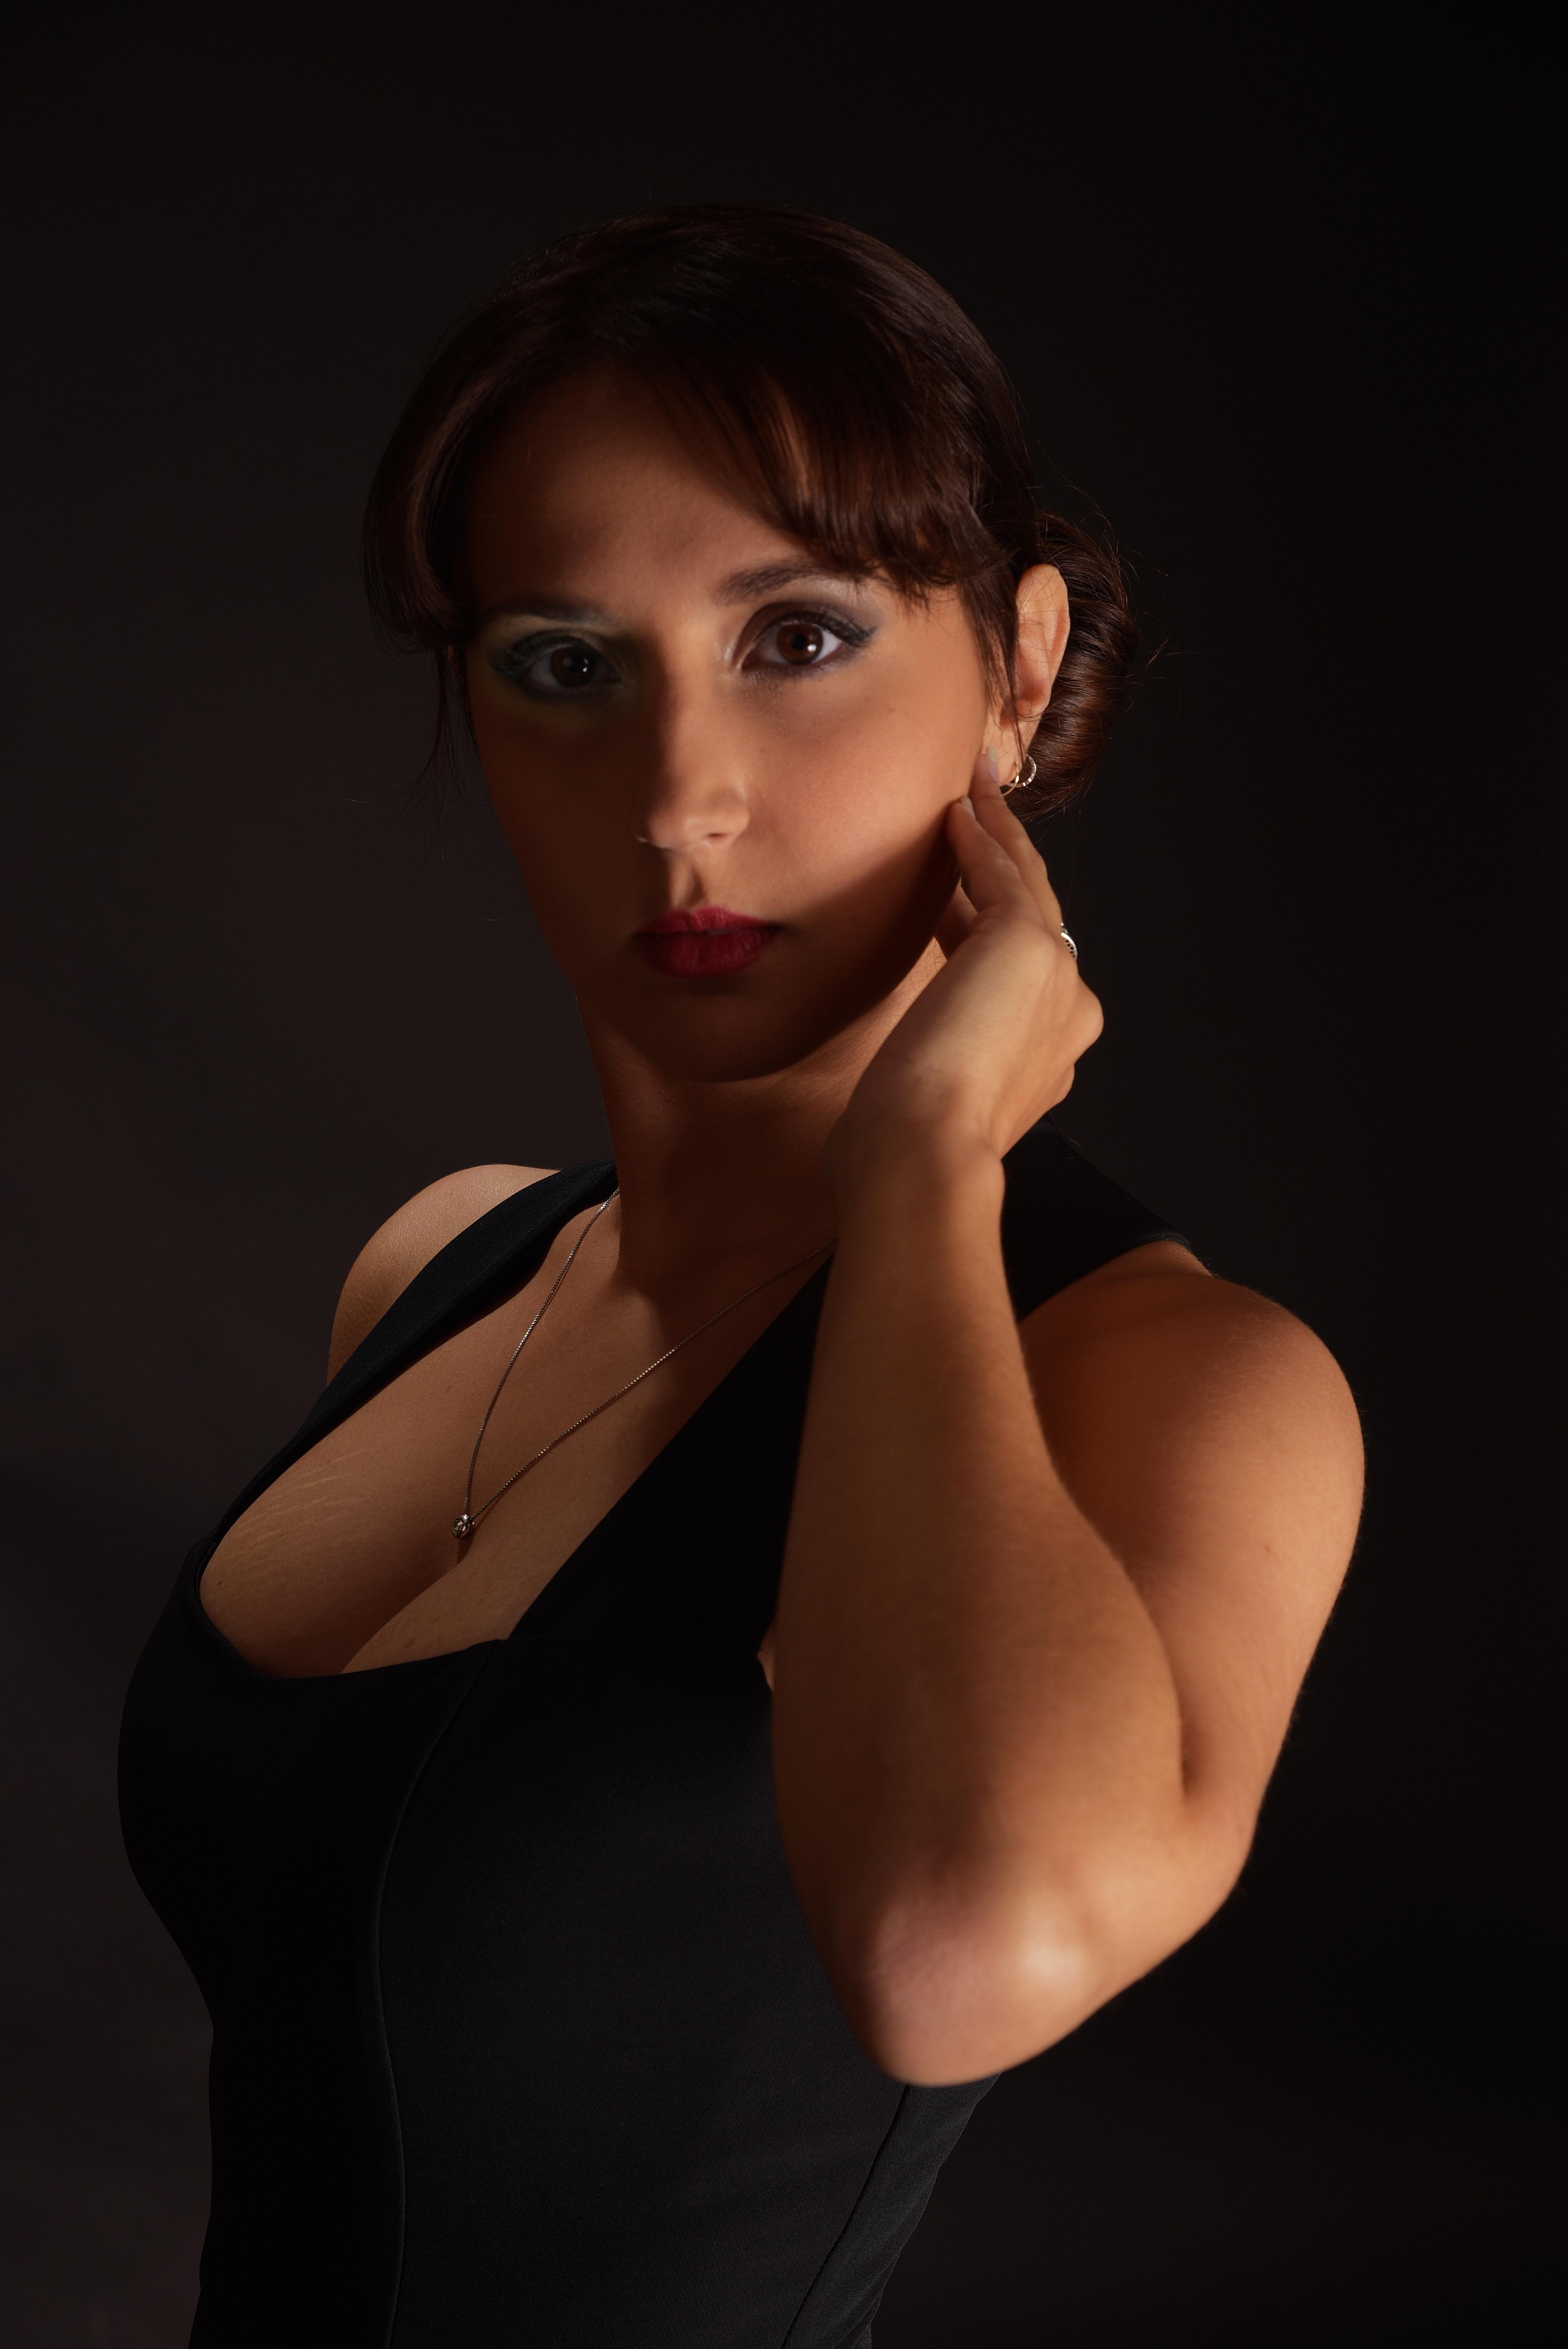 Studio Portrait Photographer Milan